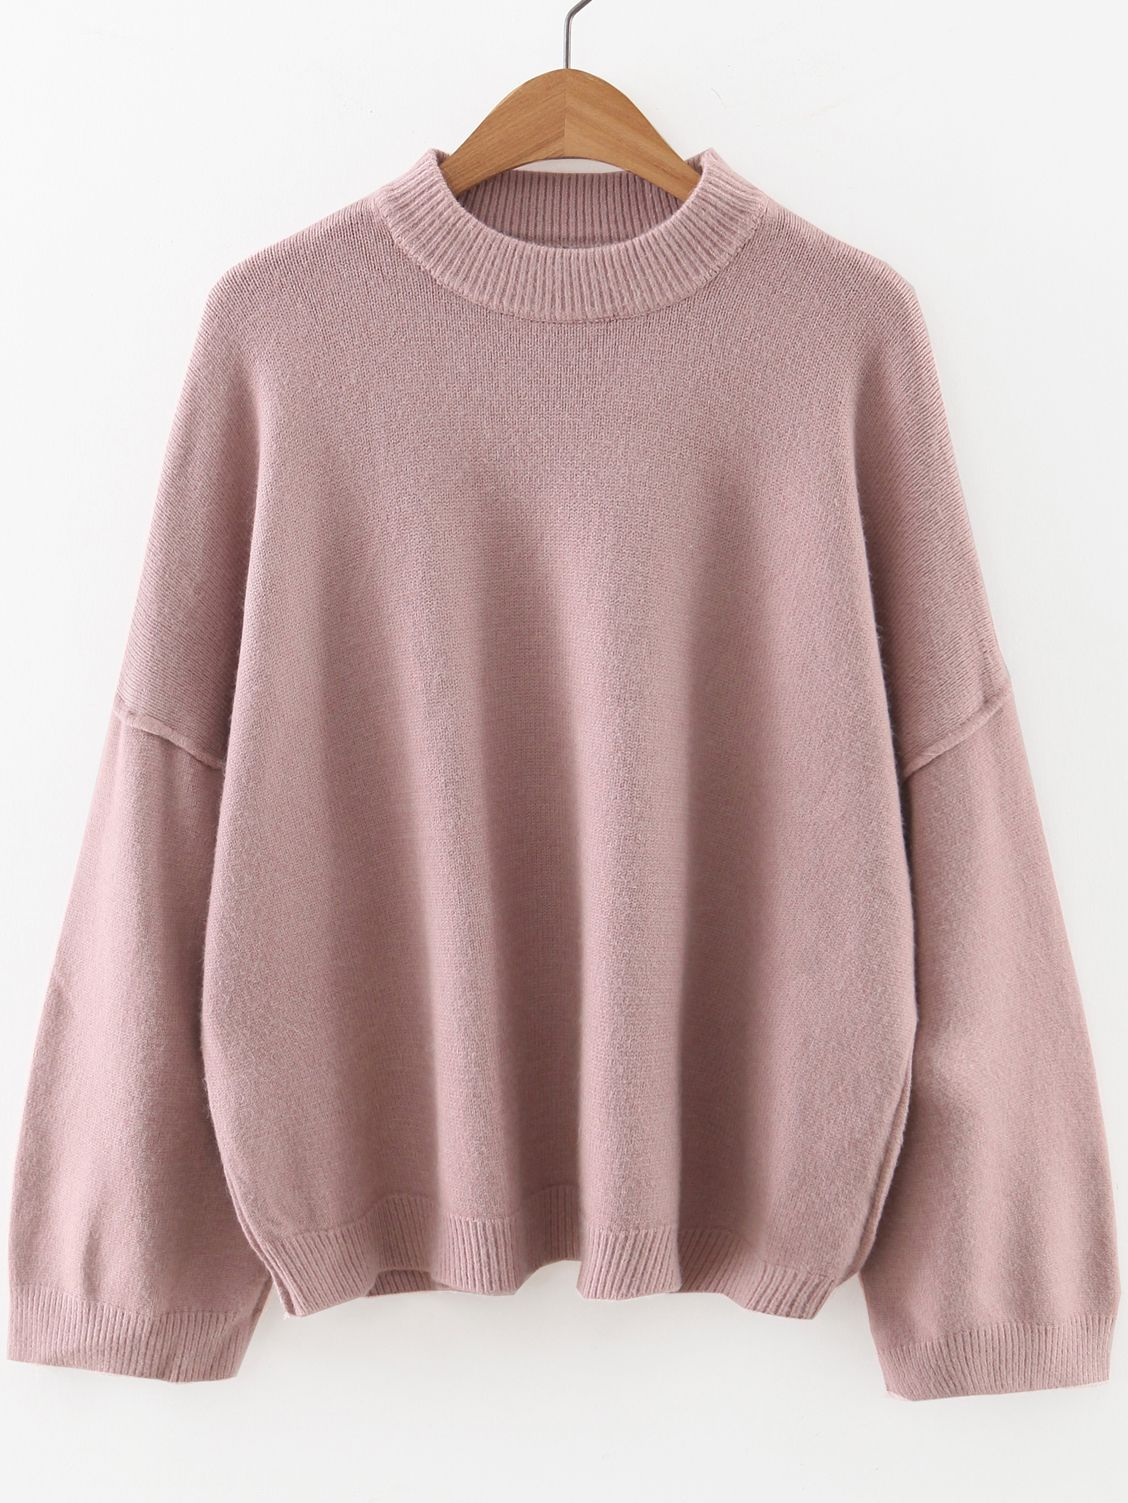 69e68ebb3 Shop Pink Crew Neck Drop Shoulder Sweater online. SheIn offers Pink ...